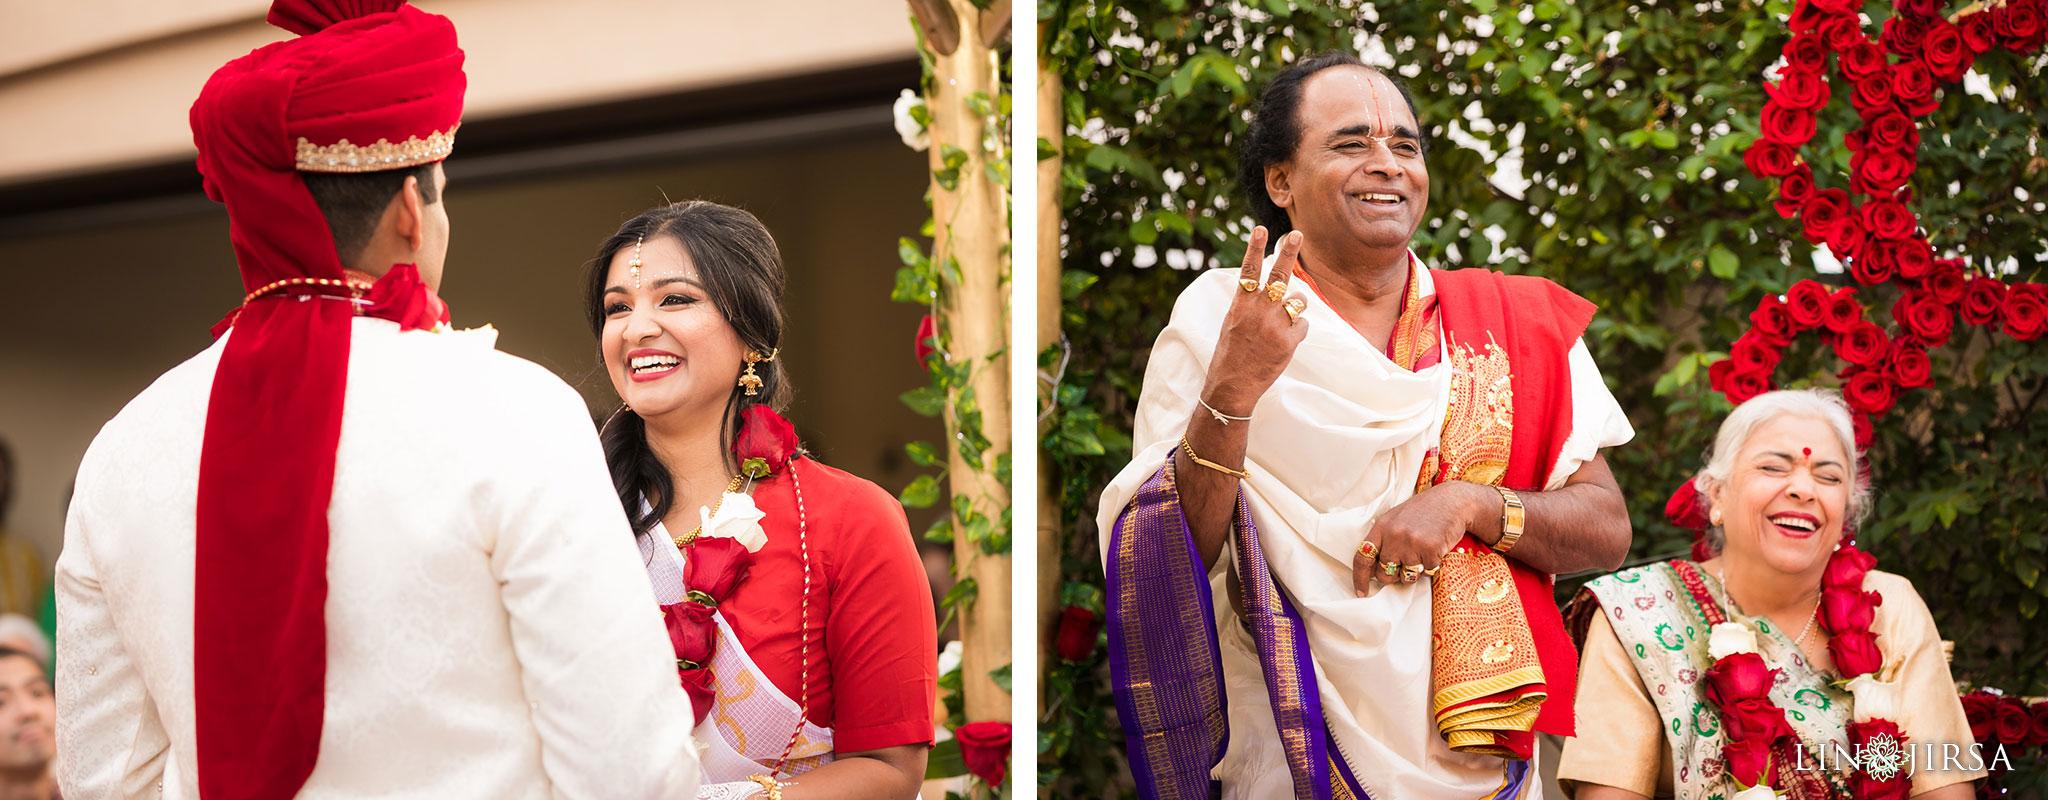 42 Orange County Indian Wedding Photography